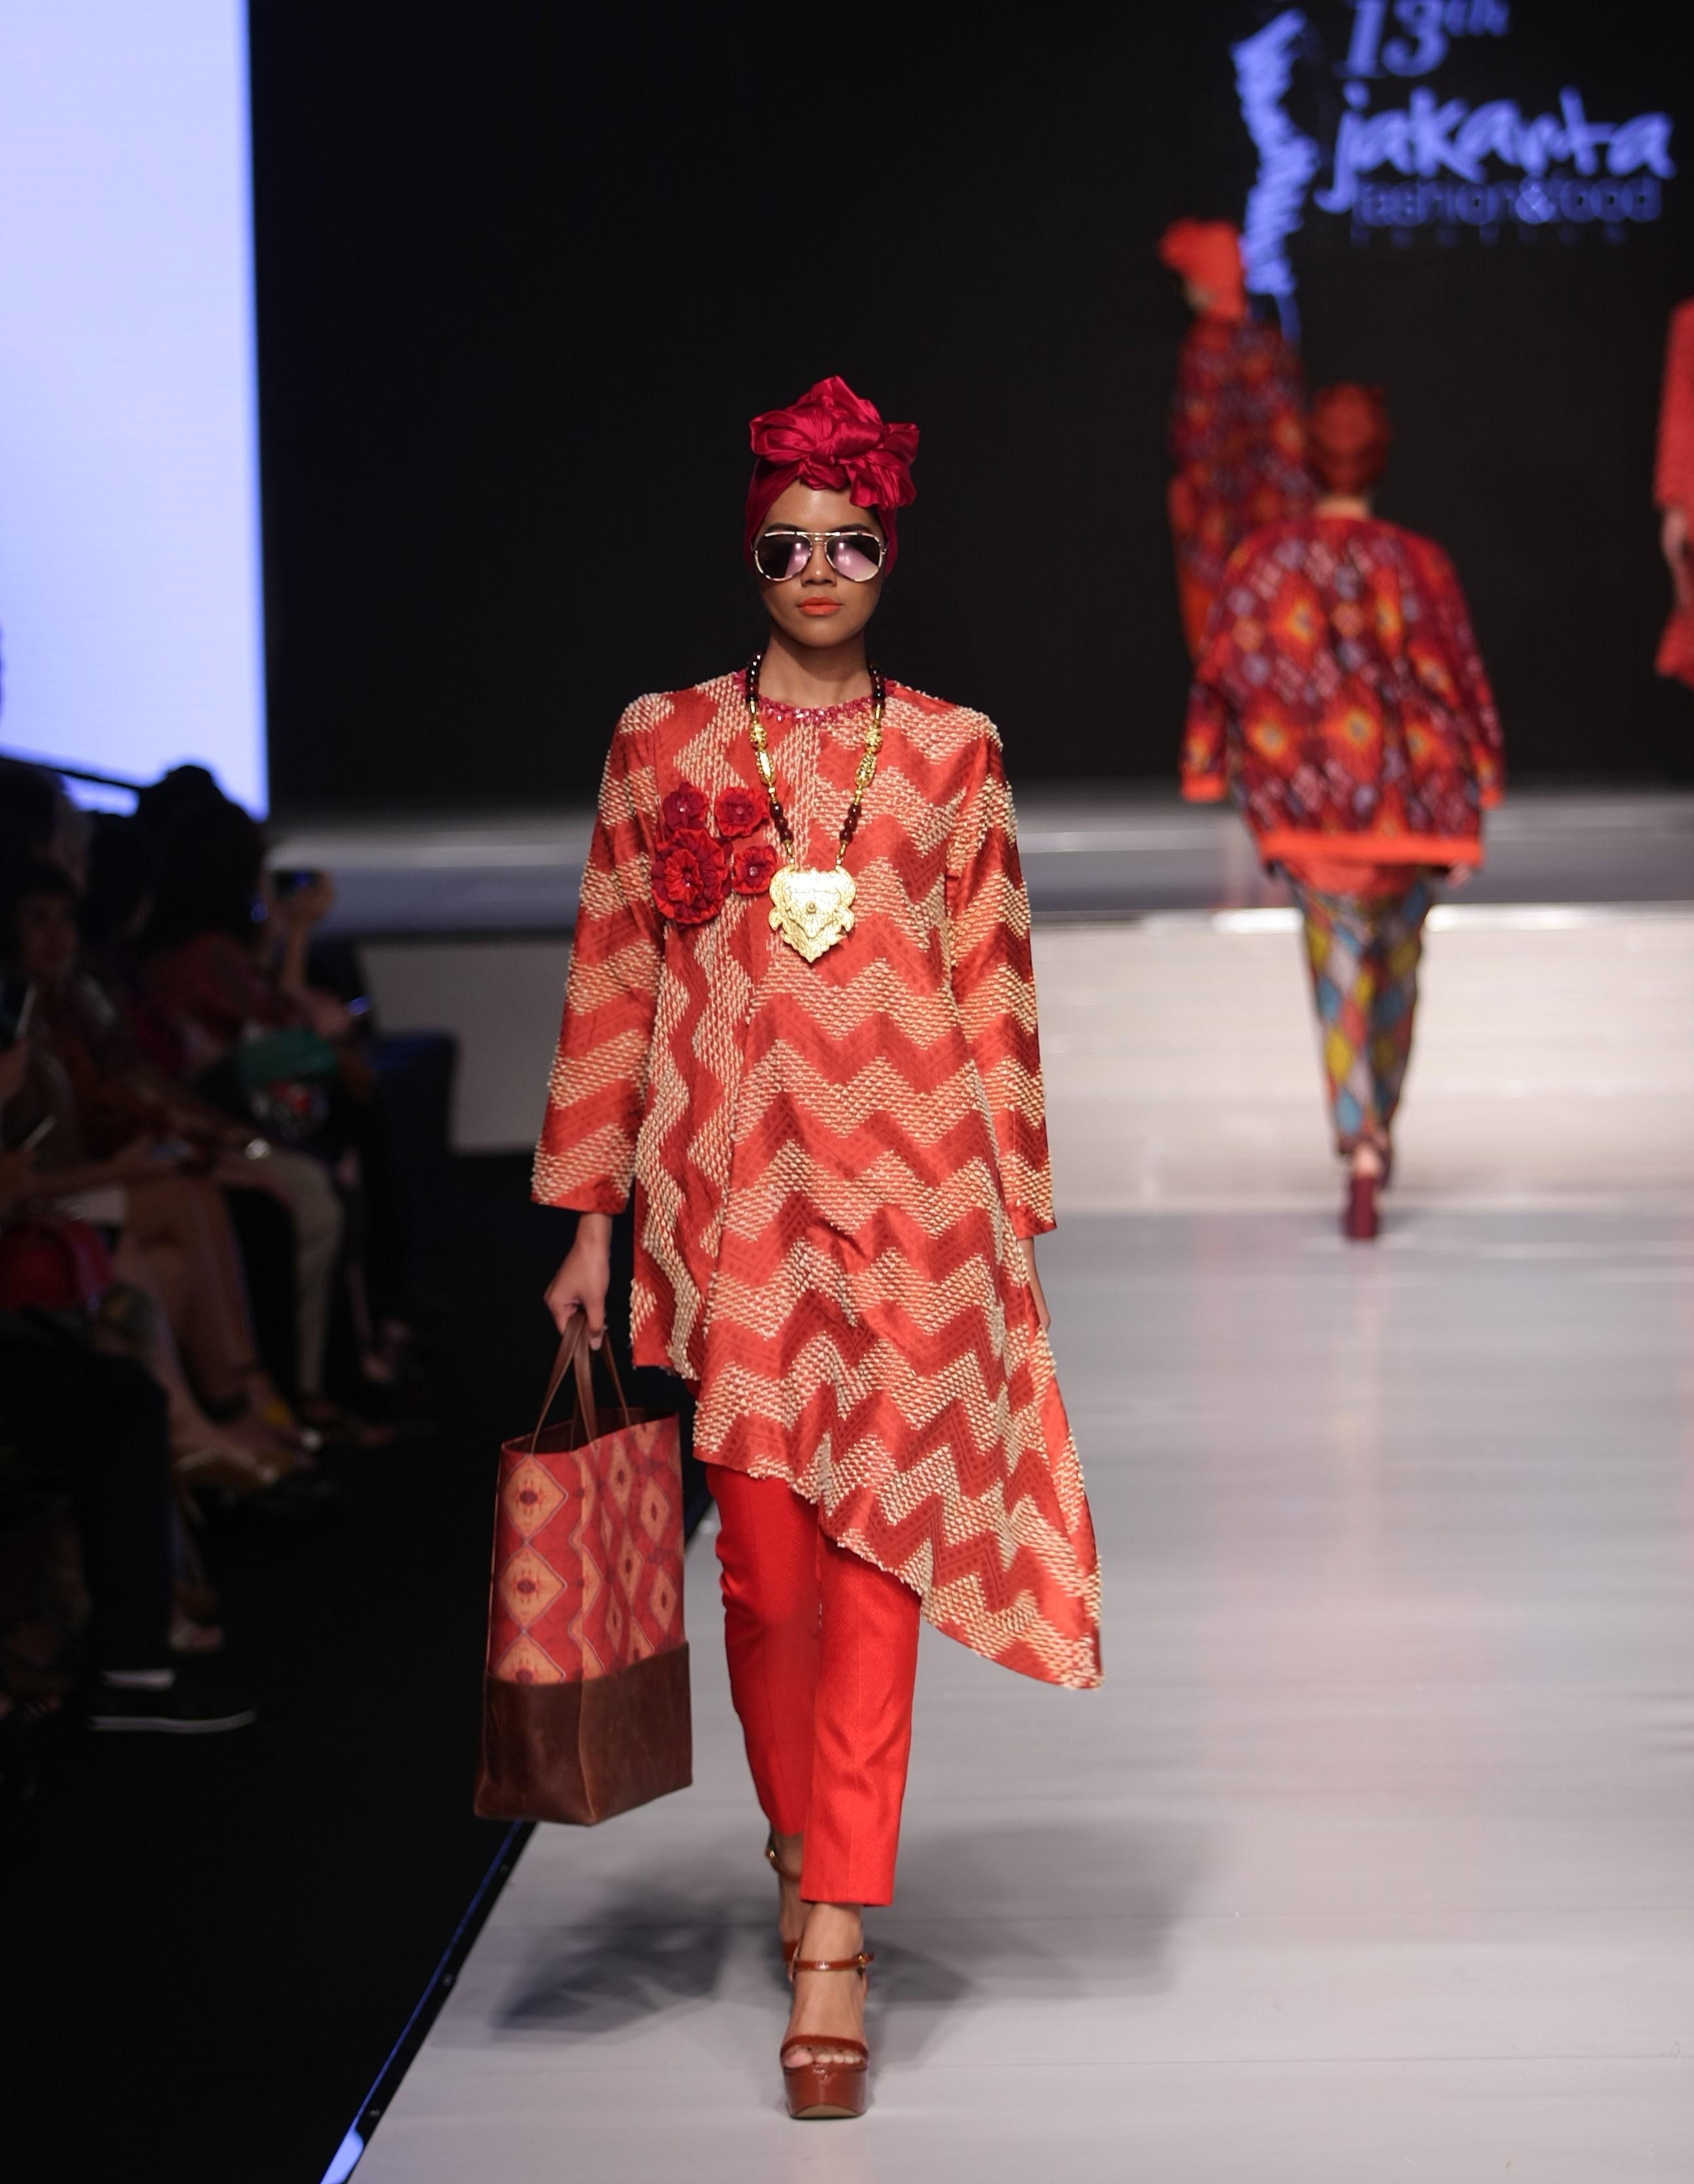 Tunik motif batik zig zag asimetris